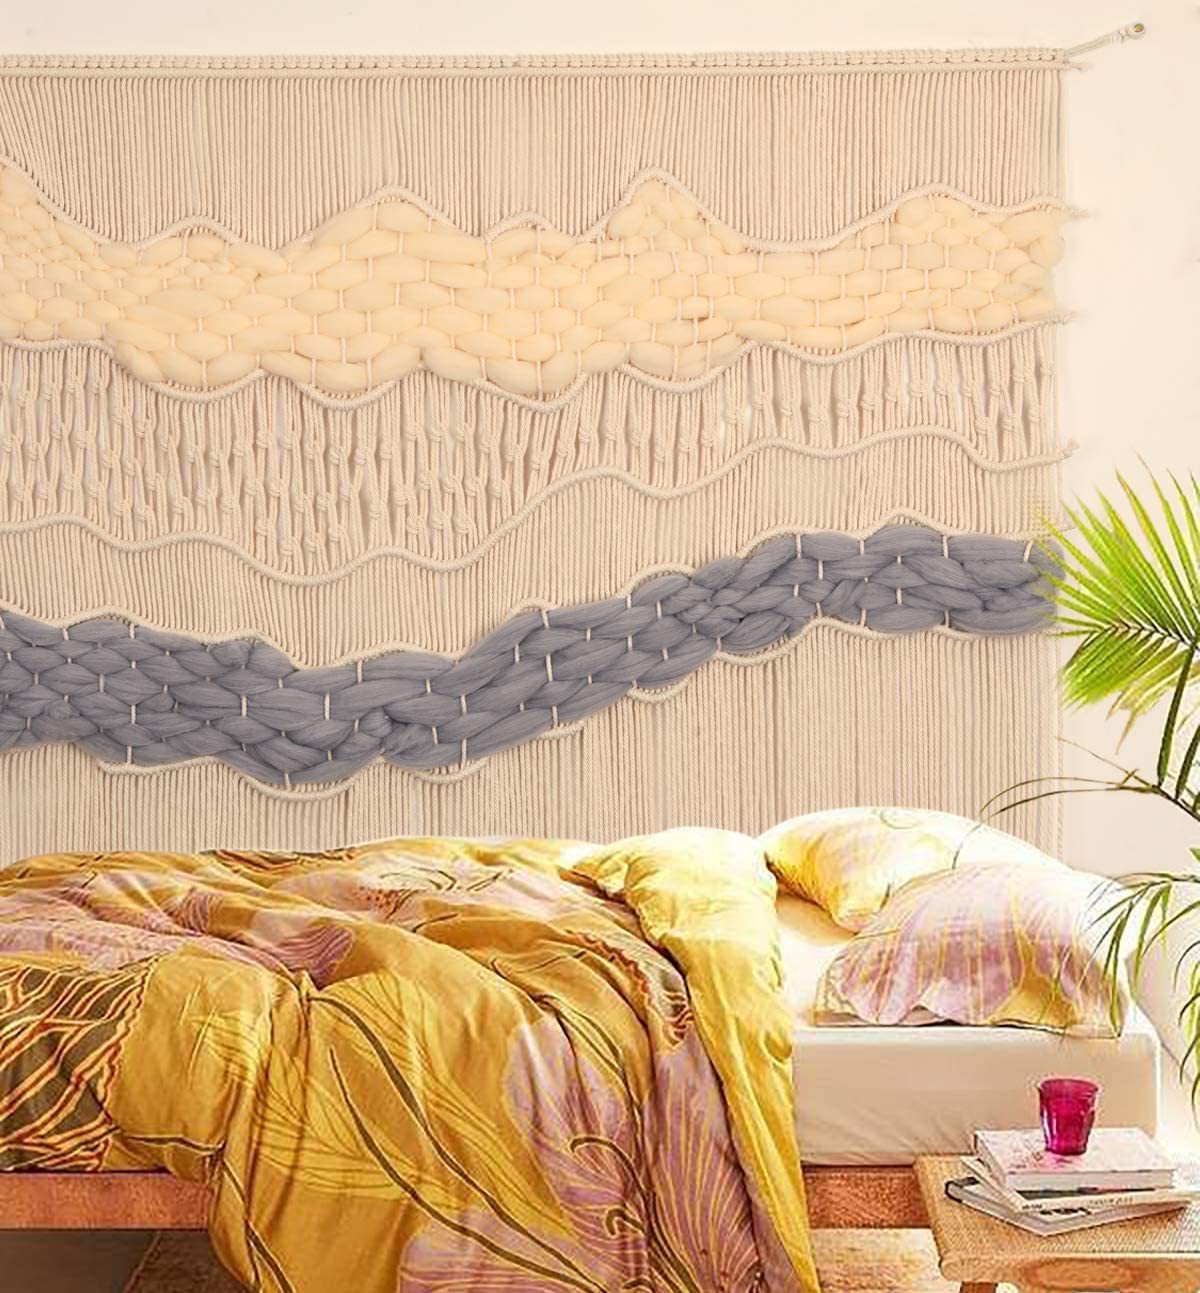 Flber Macrame Wall Hanging Macrame Curtain Boho Handmade Wall Art,52 x 40